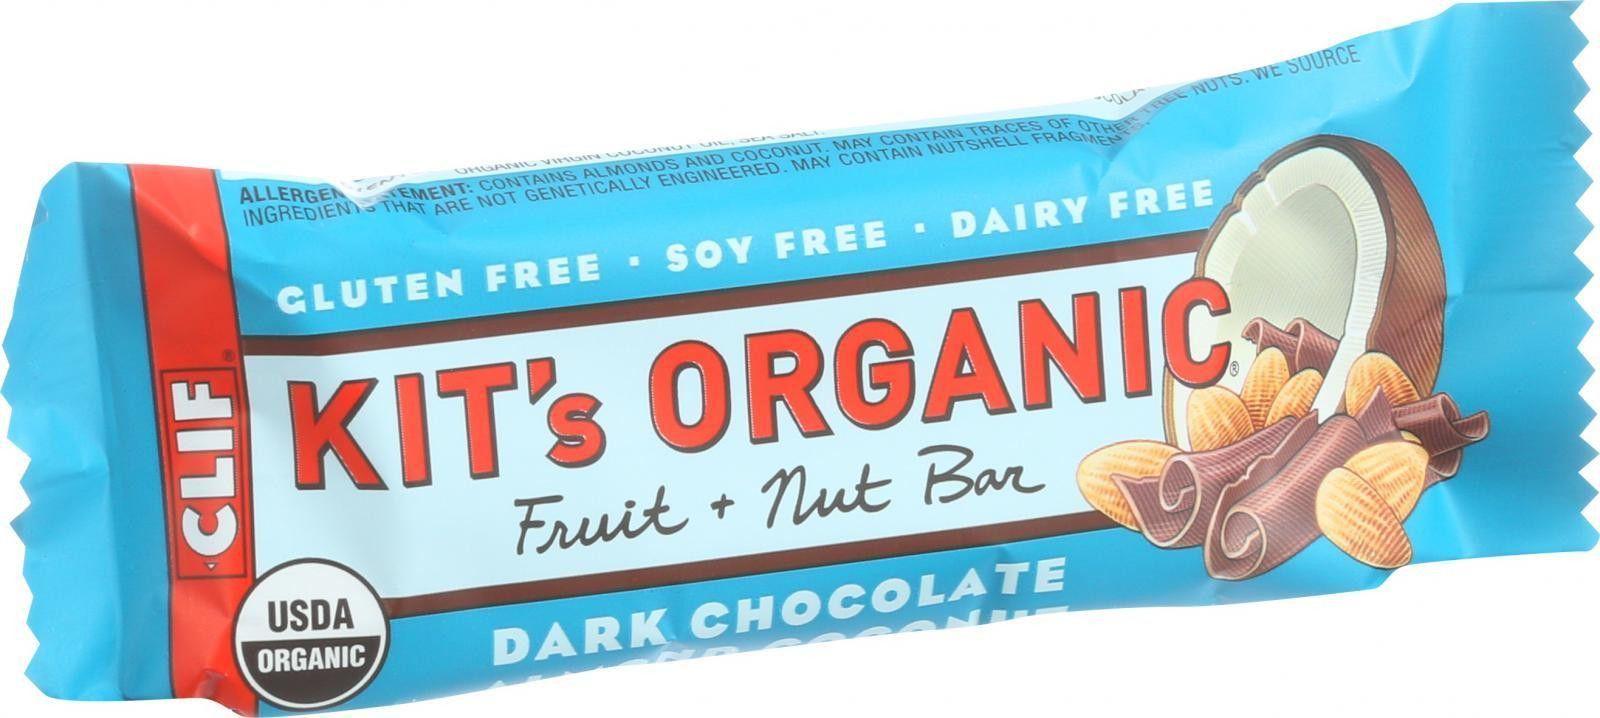 Clif Kit's Organic Fruit And Nut Bar - Dark Chocolate Almond Coconut - Case Of 12 - 1.69 Oz Bars